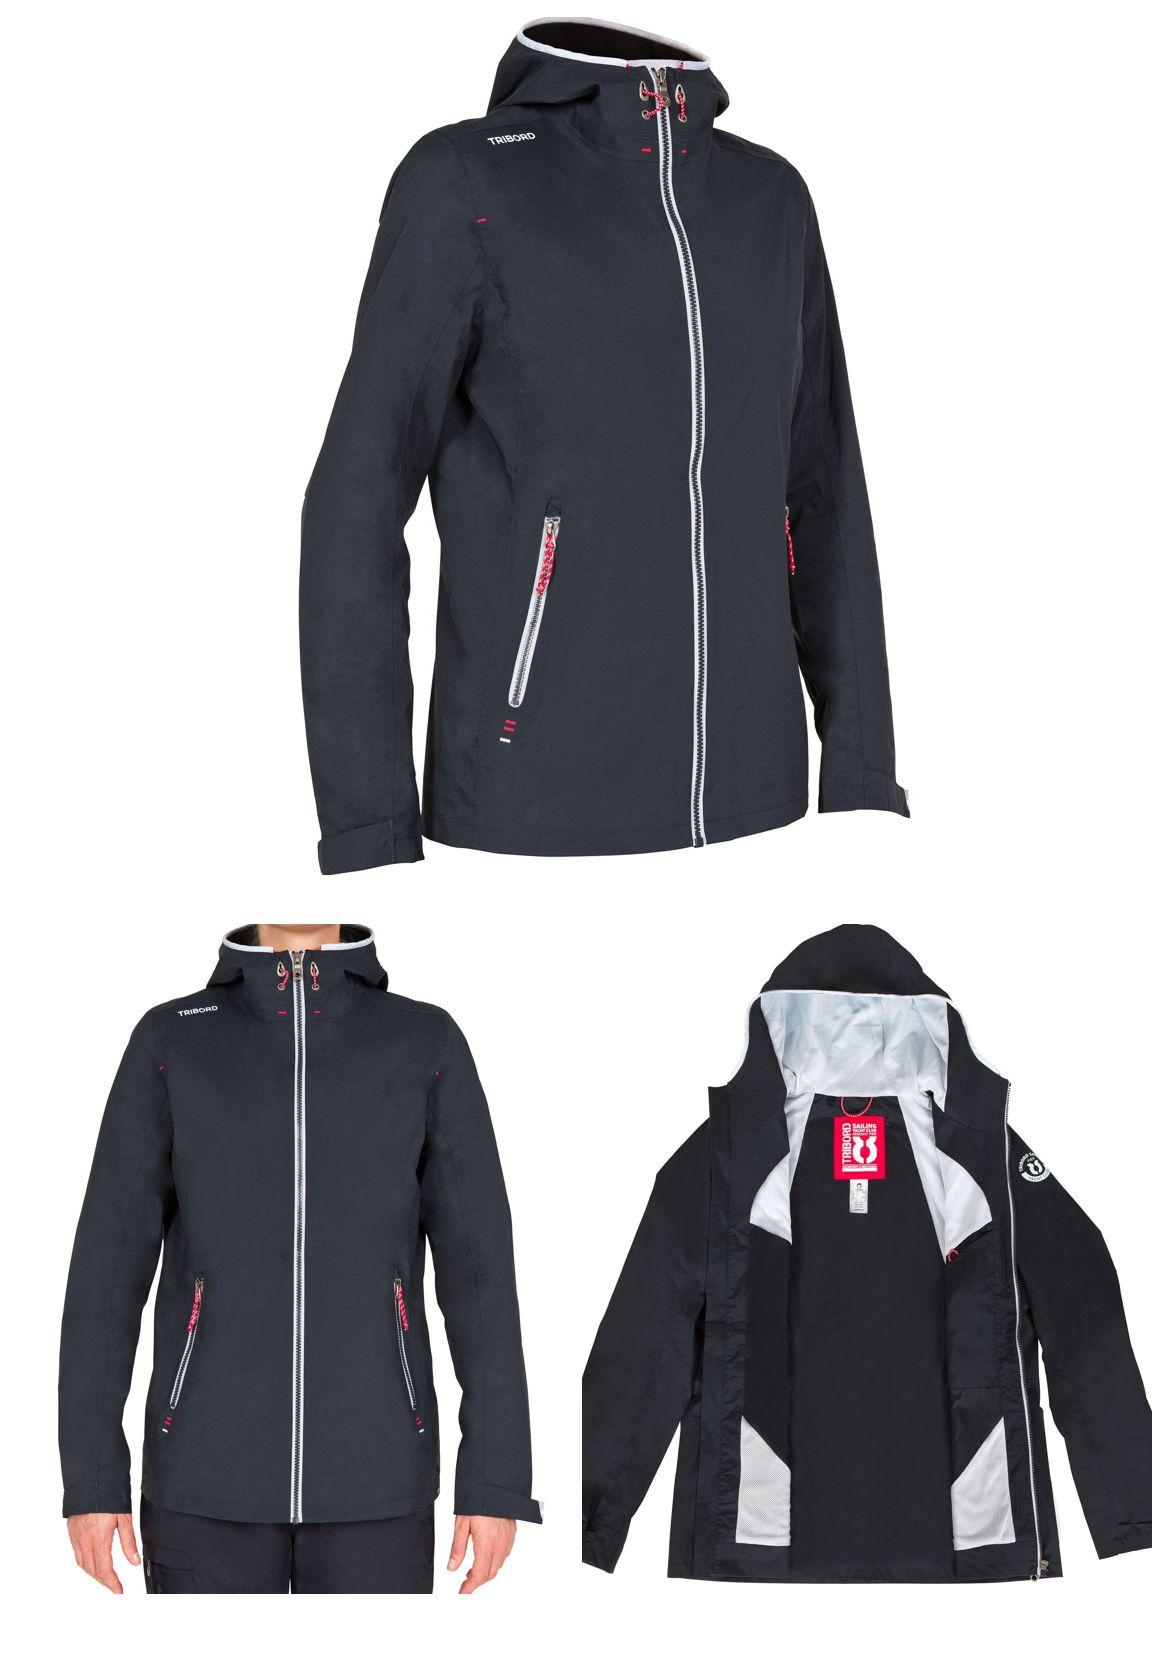 Decathlon Blue Raincoastal Style Collection 201415 My Jacket rOrw7Ex